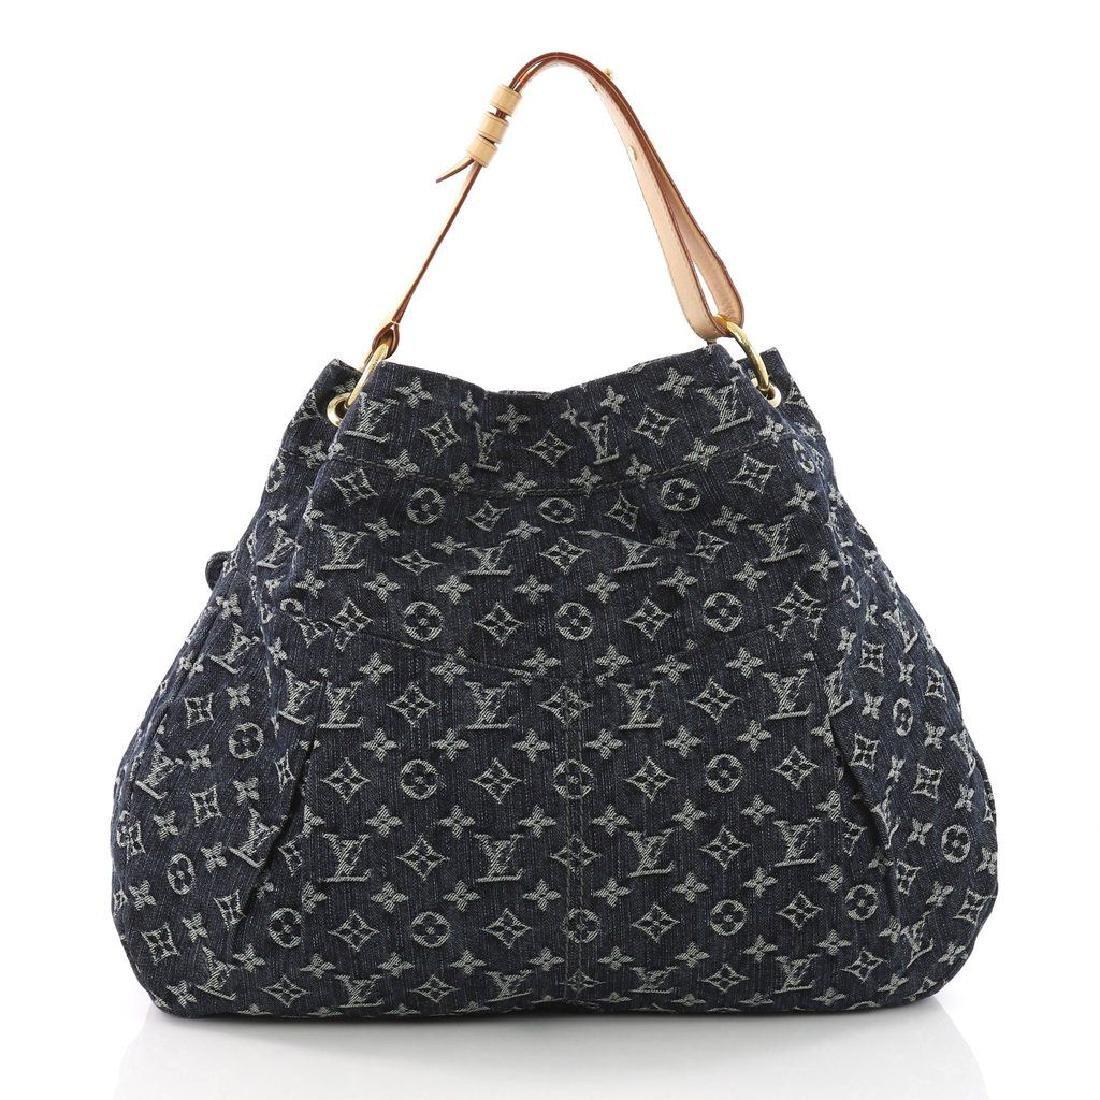 Louis Vuitton Daily Gm Jean Gris Bleu Denim Hobo Bag - 2